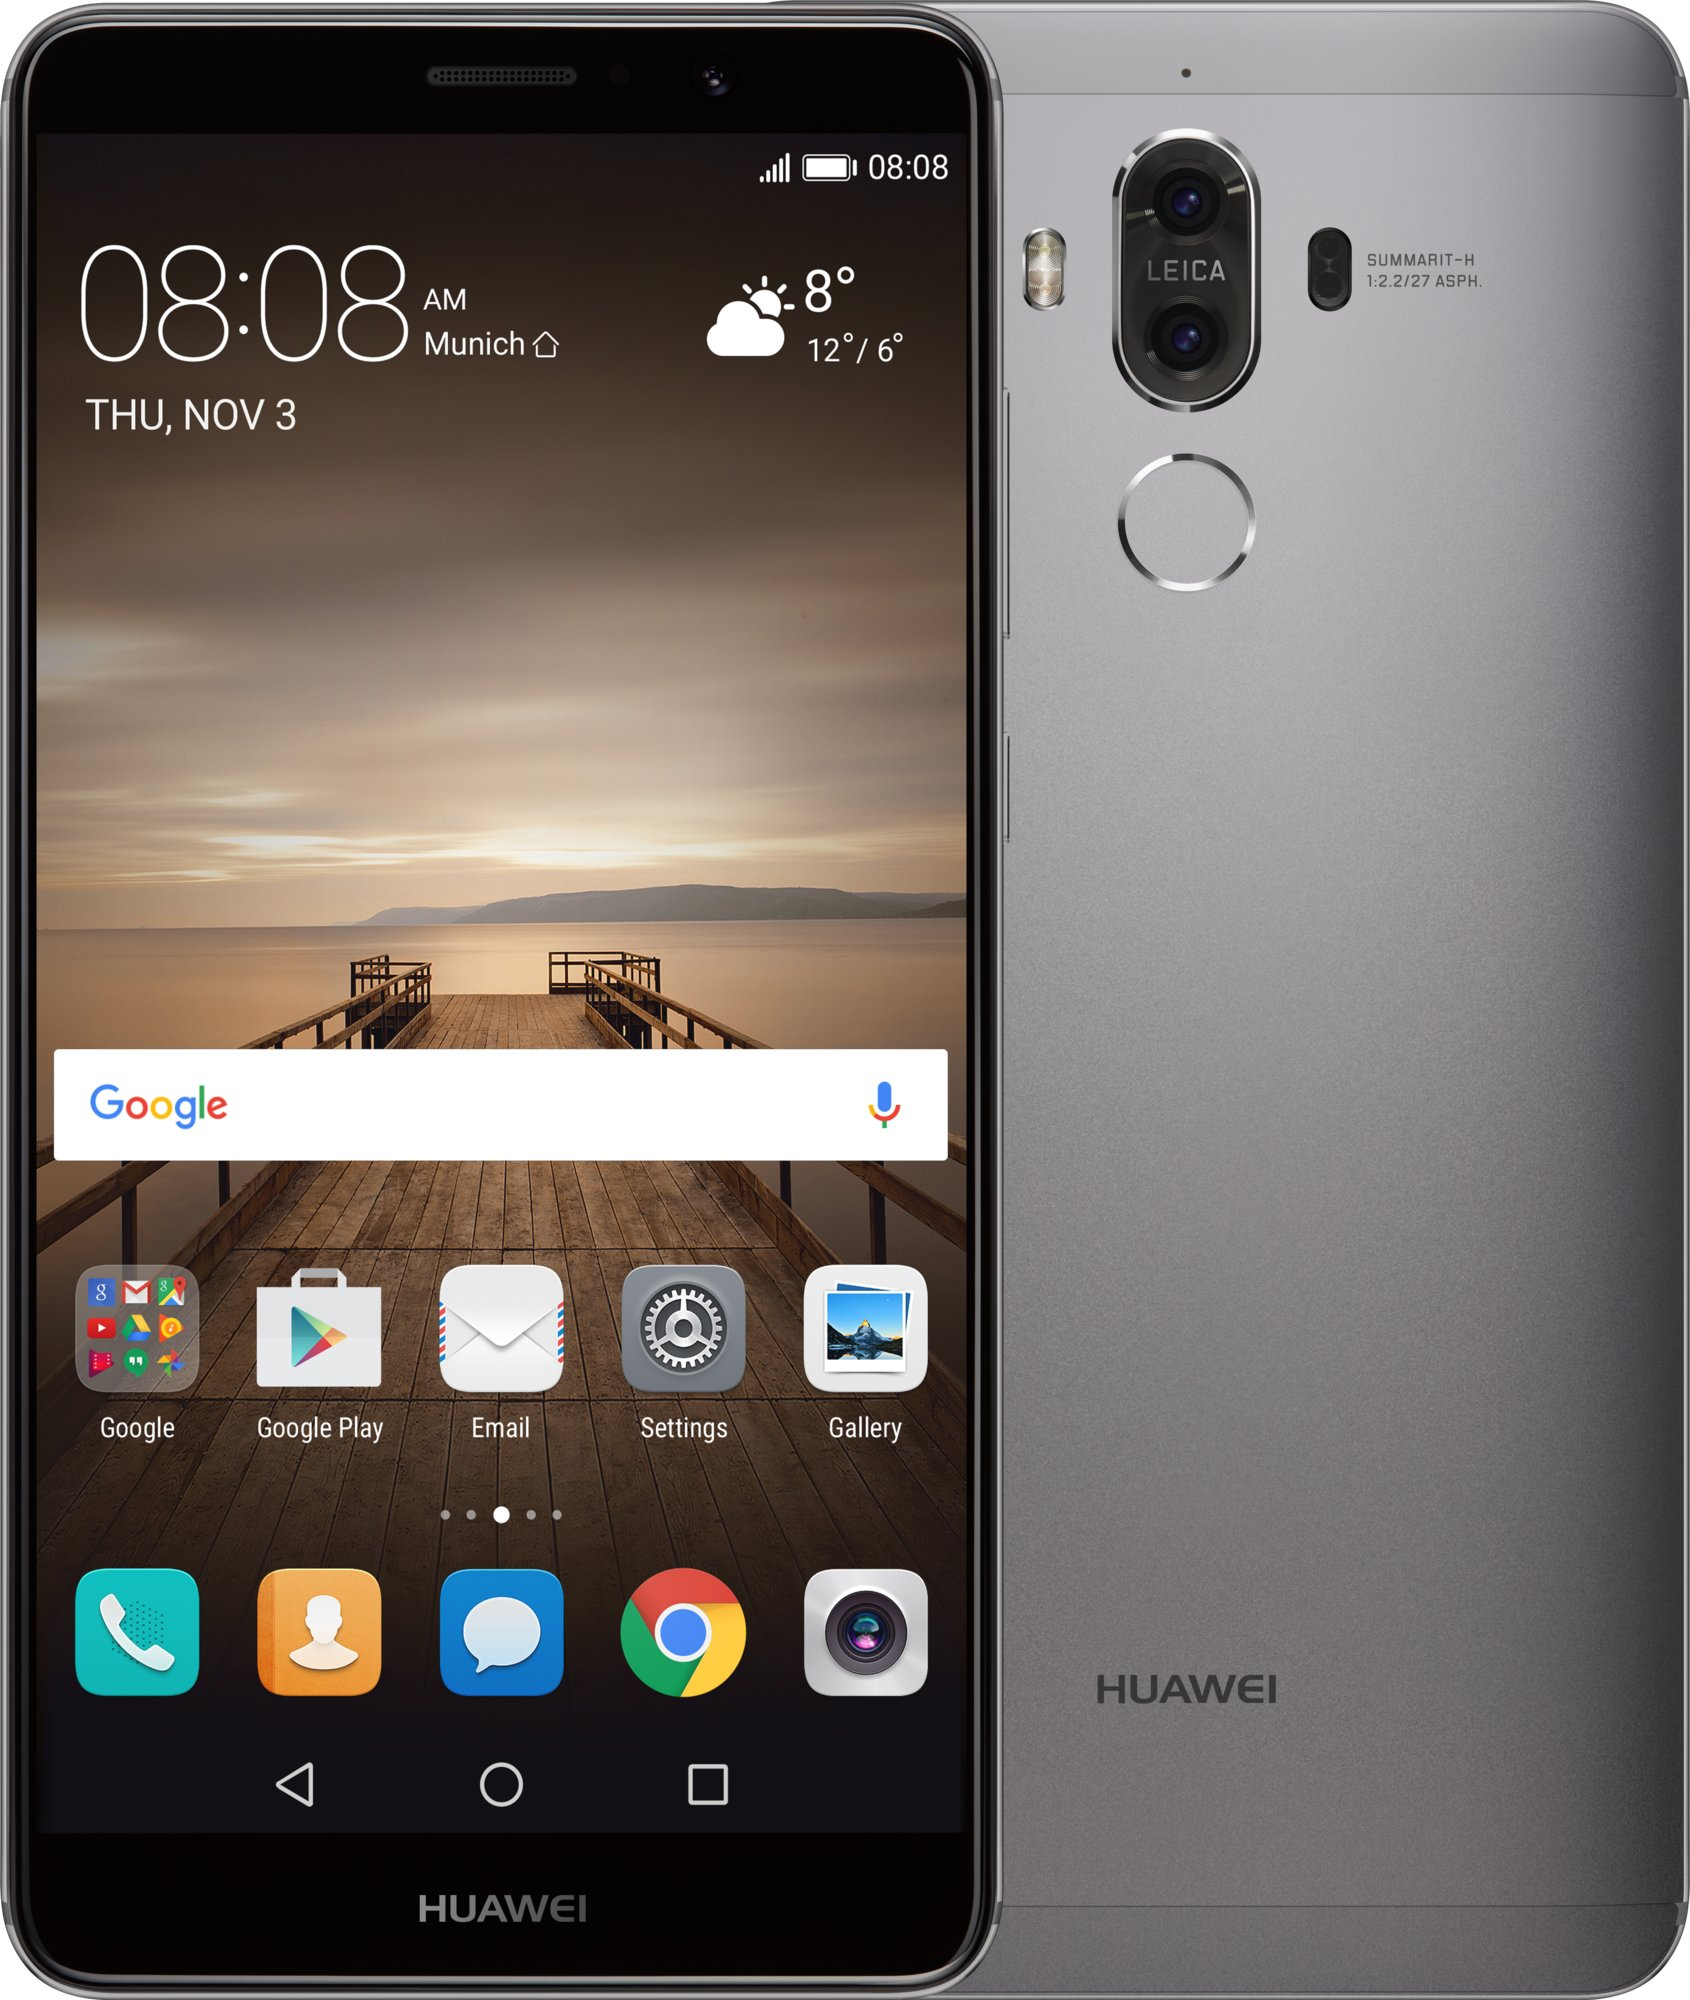 Huawei Mate 9 64GB Space Gray